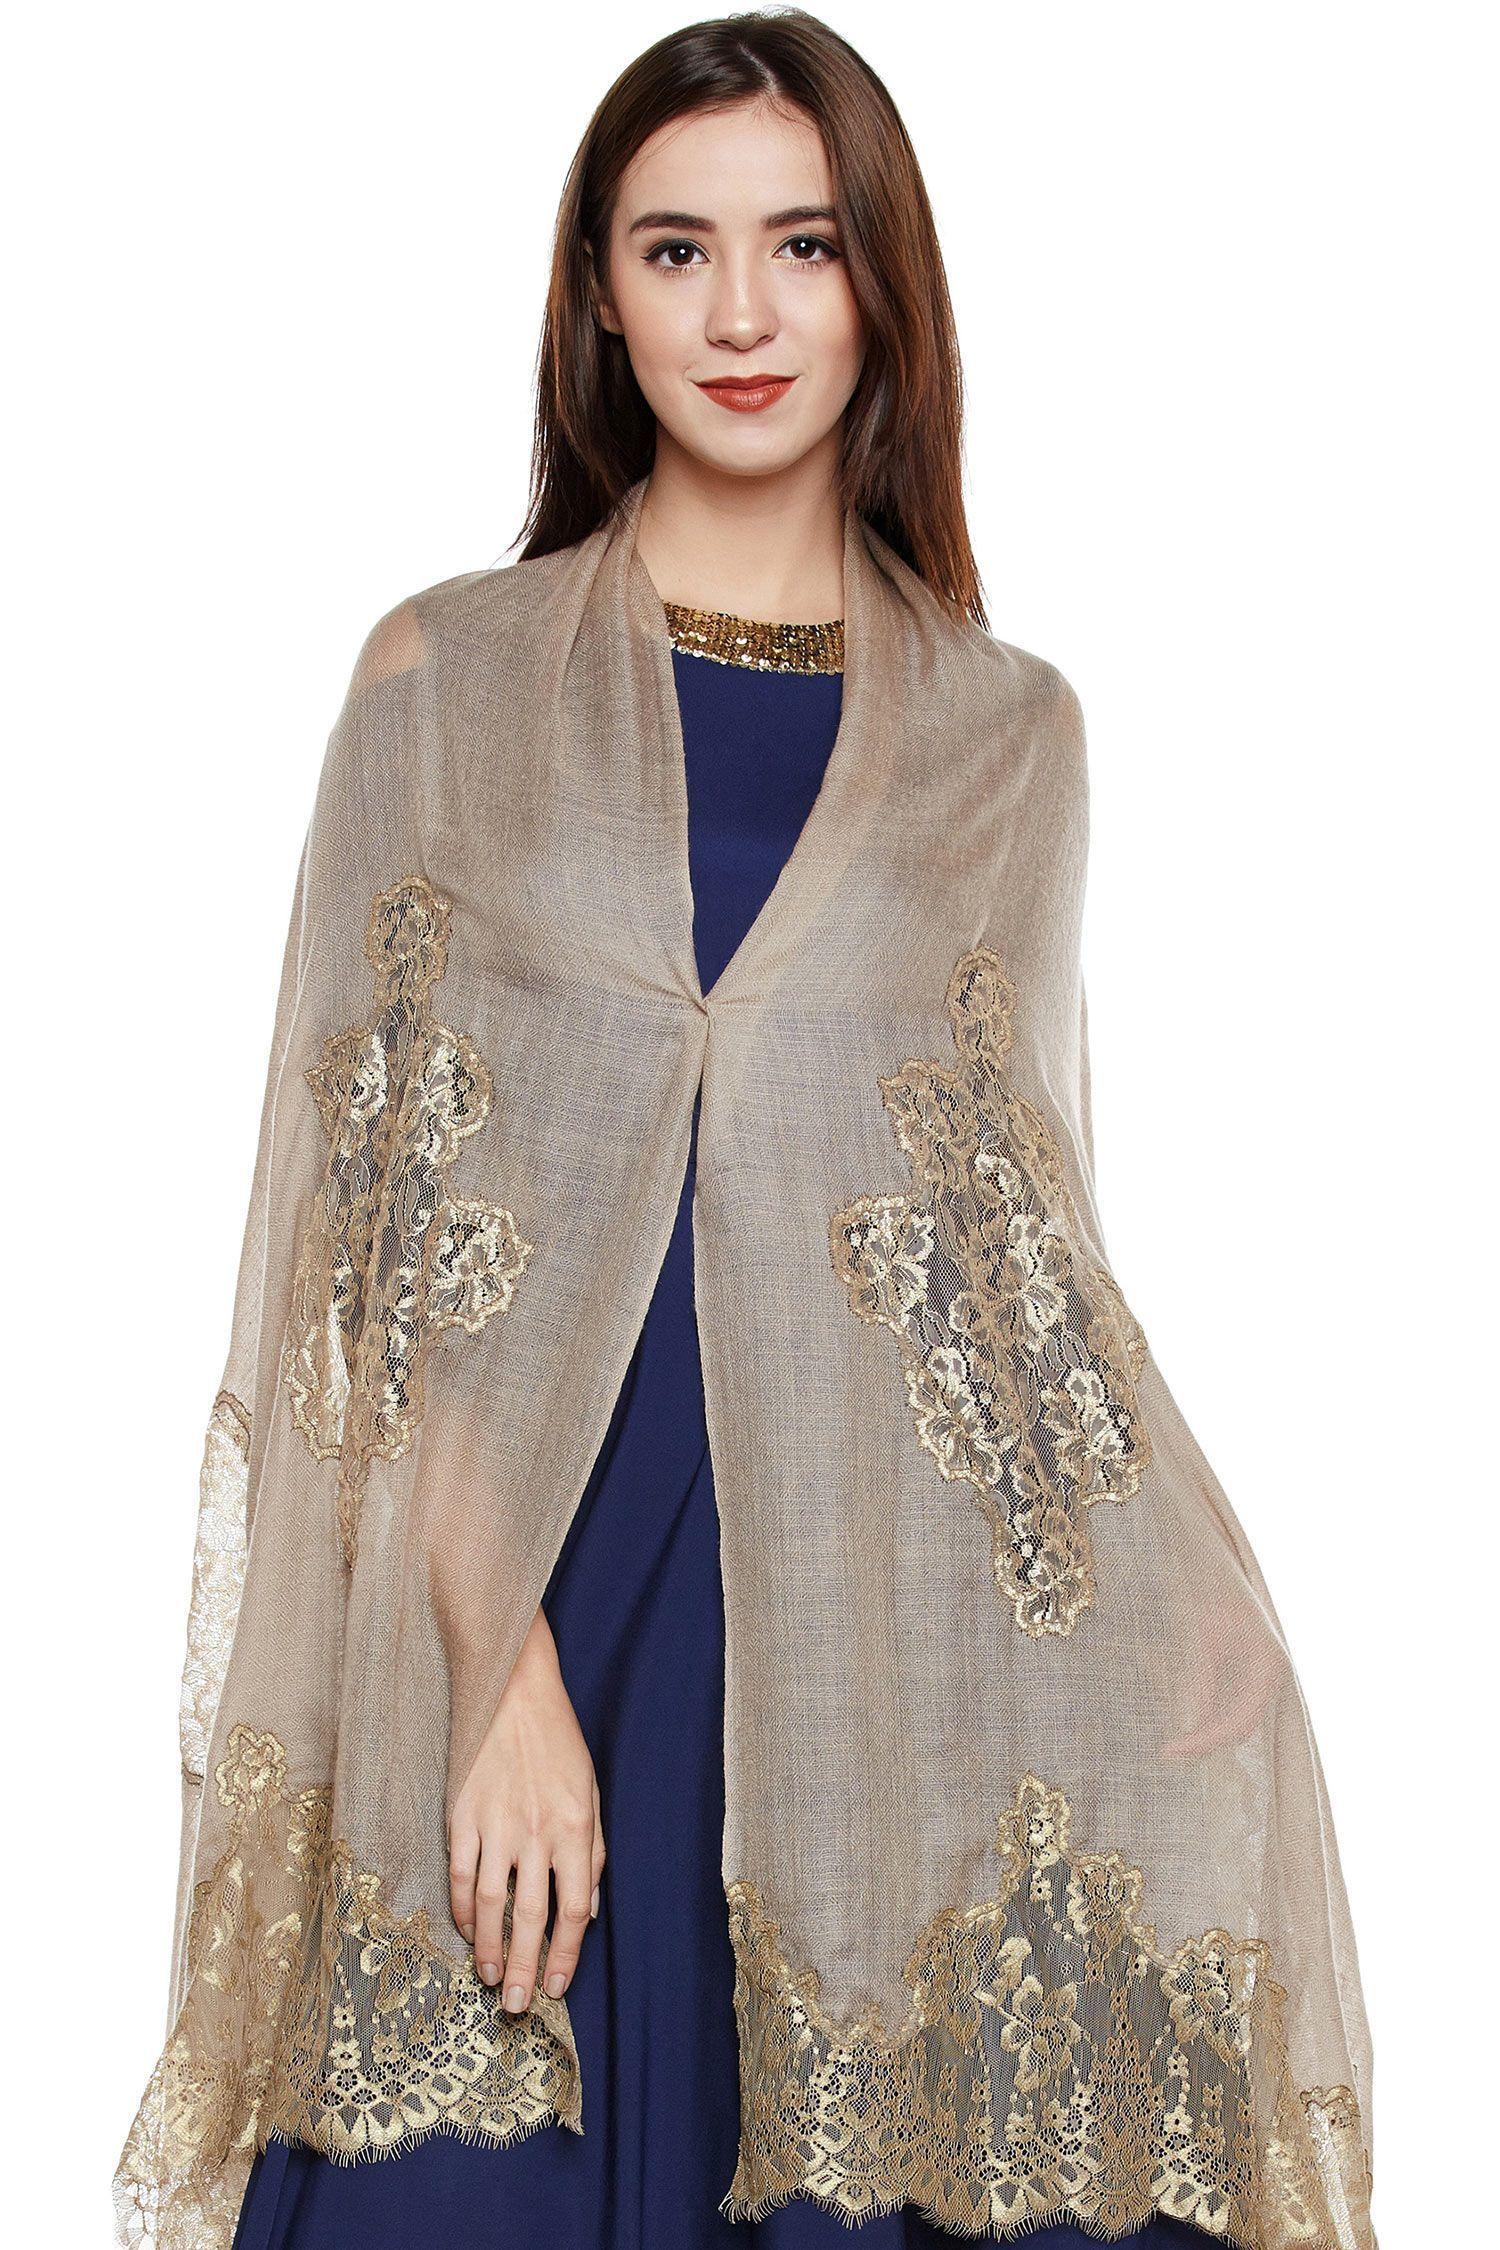 Toosh Lace-Paneled Cashmere Wrap | Pure Pashmina